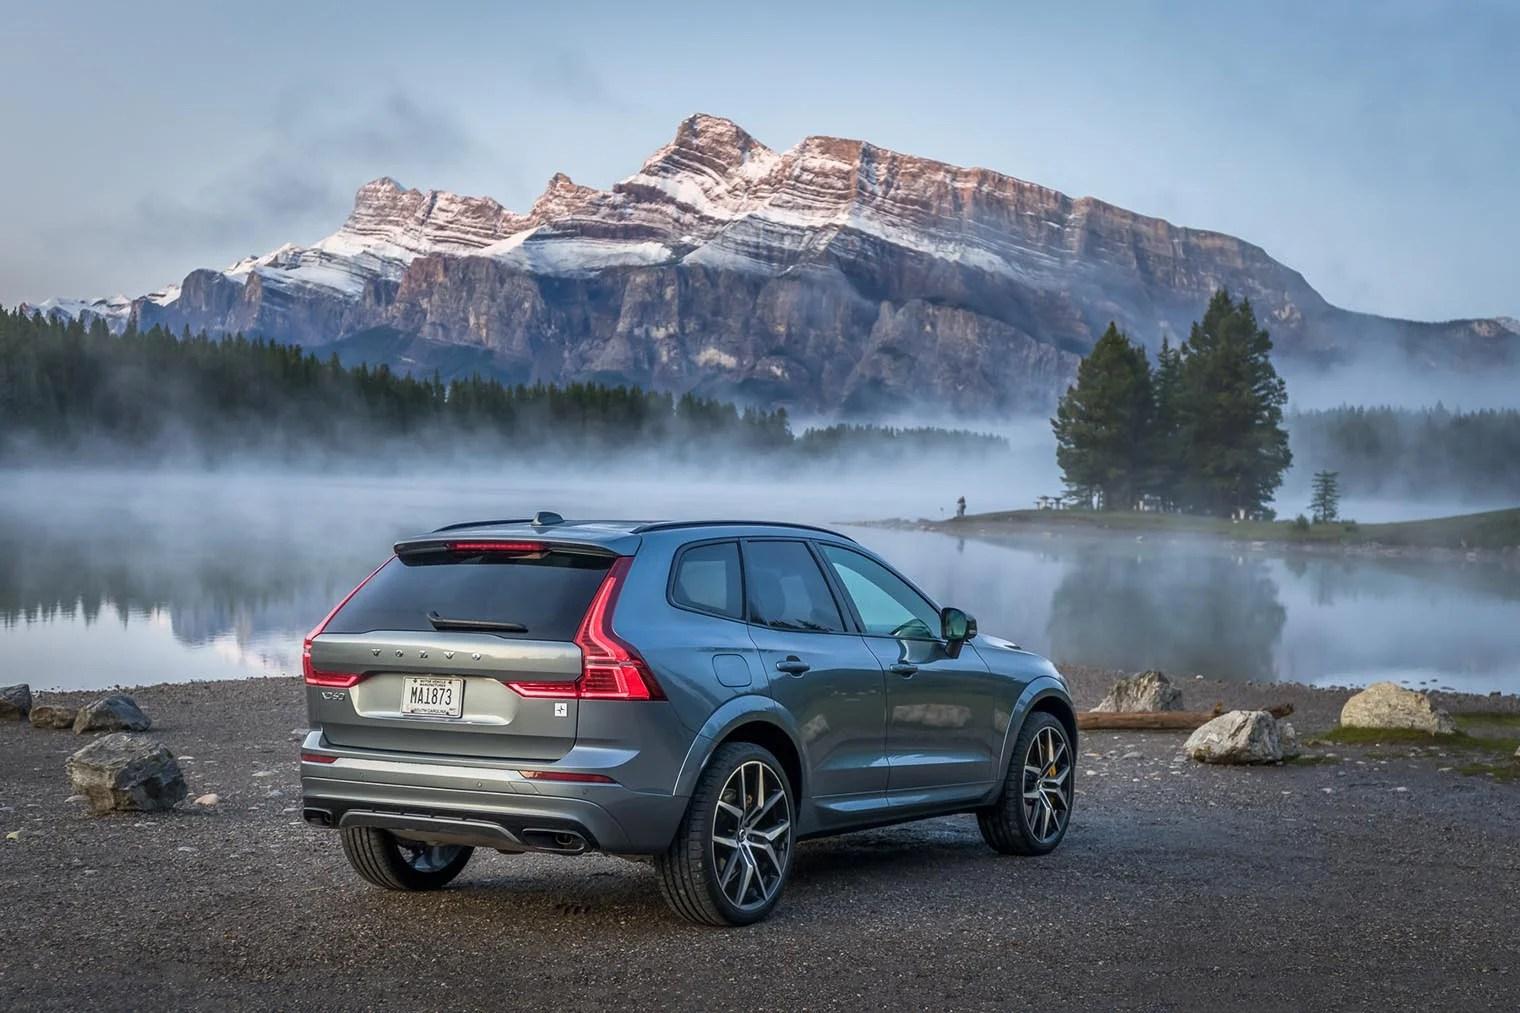 First Drive: 2020 Volvo XC60 Polestar Engineered | The Detroit Bureau